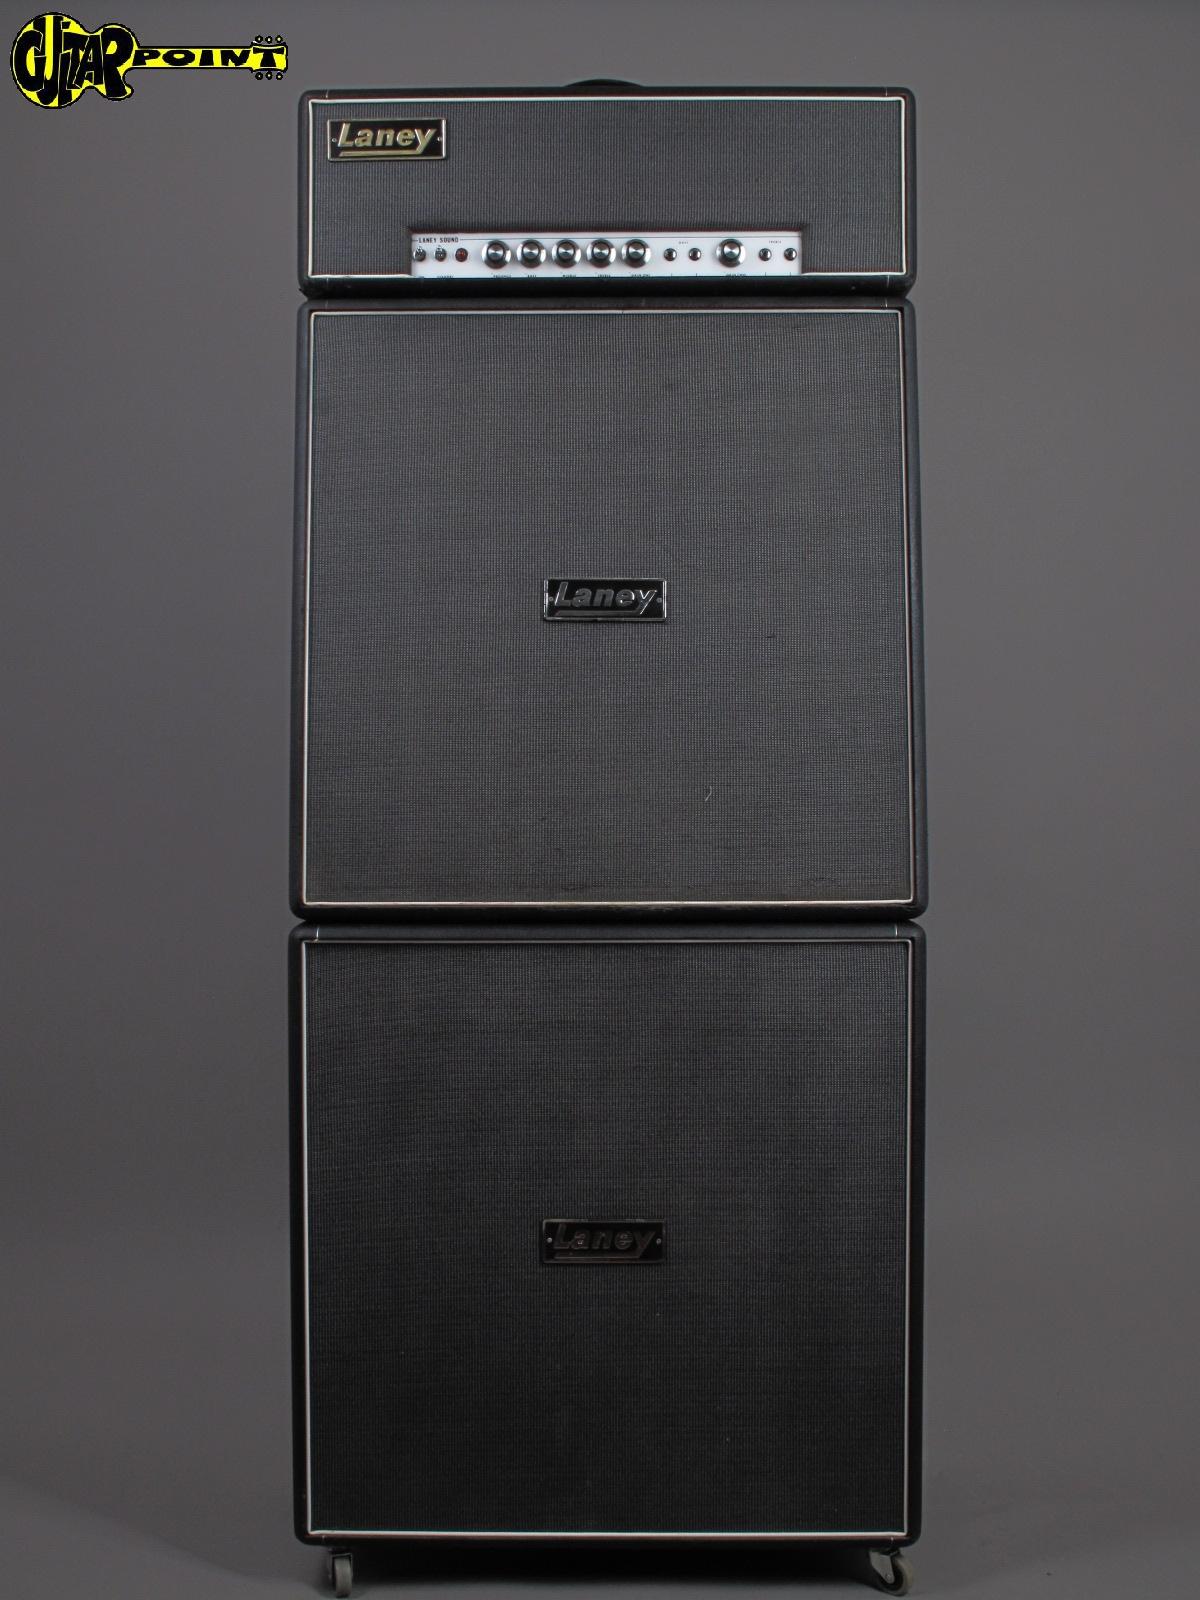 "1969 Laney Soupergroup MK1 - 100 Watt + 2 4x12"" Cabs / AEG - EL34 !!!"